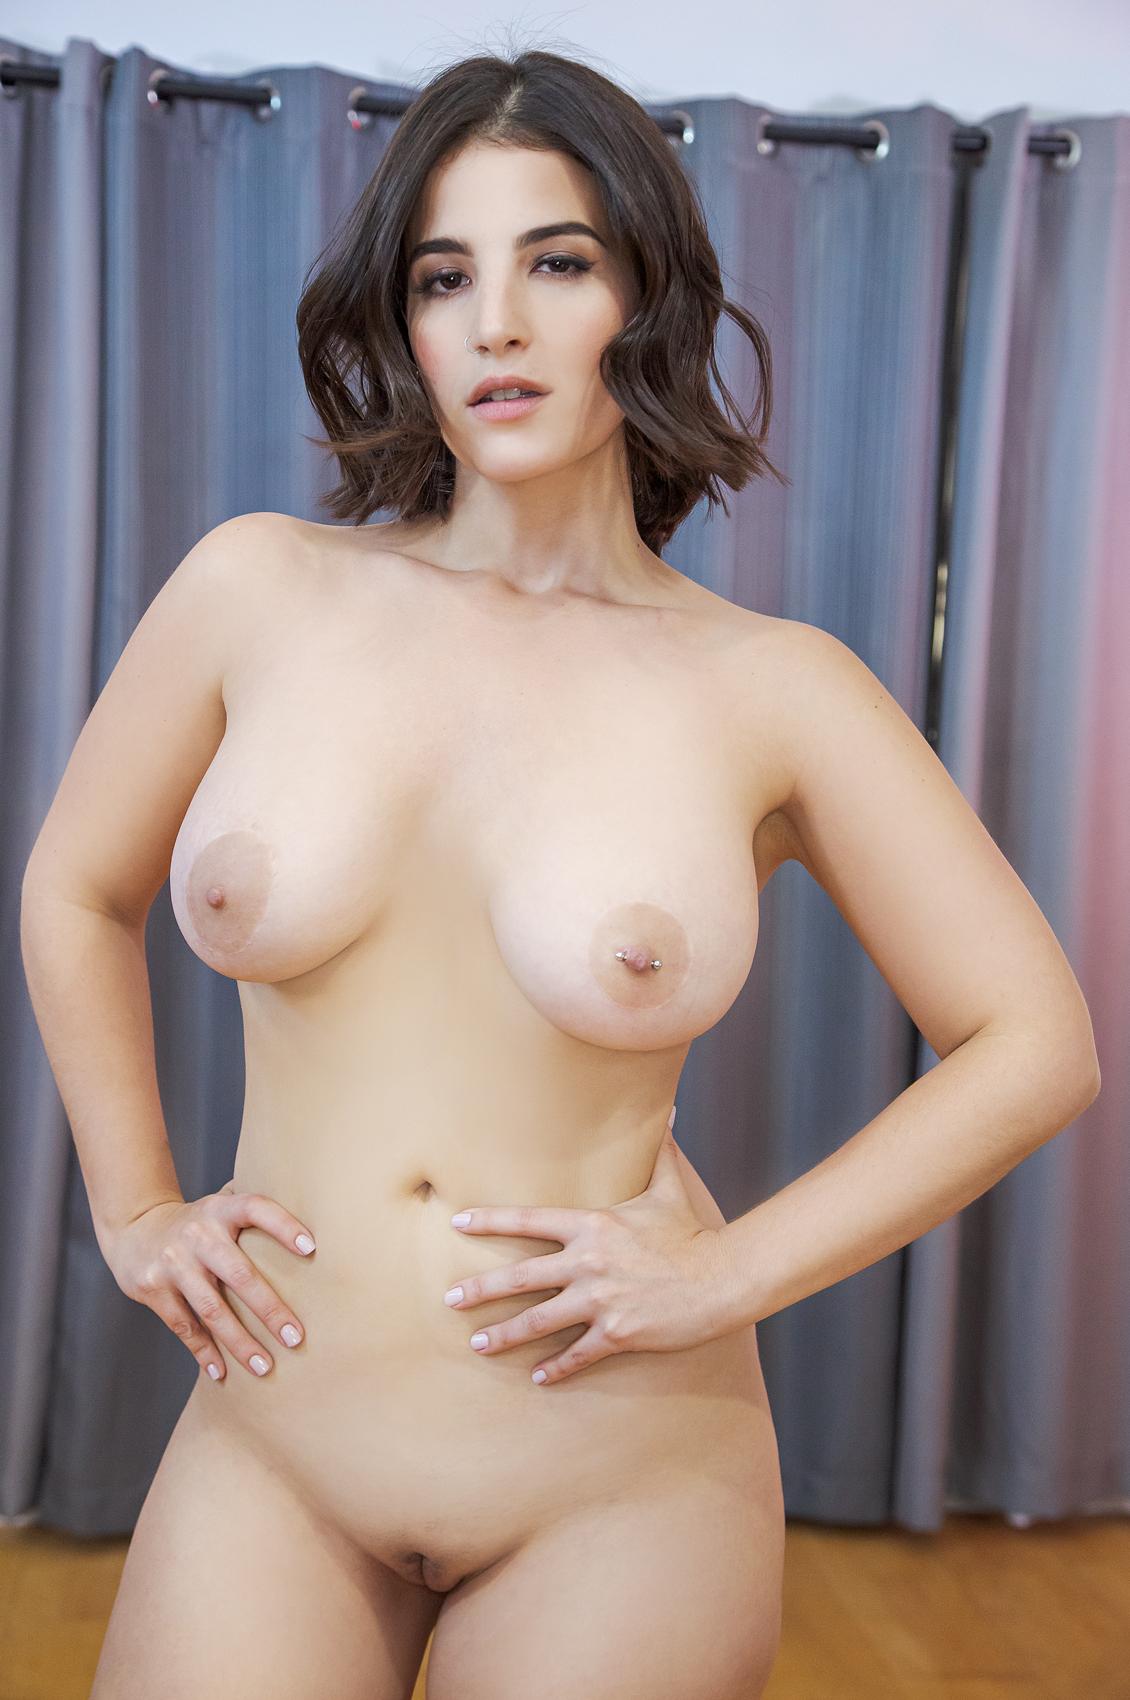 LaSirena69's VR Porn Videos, Bio & Free Nude Pics